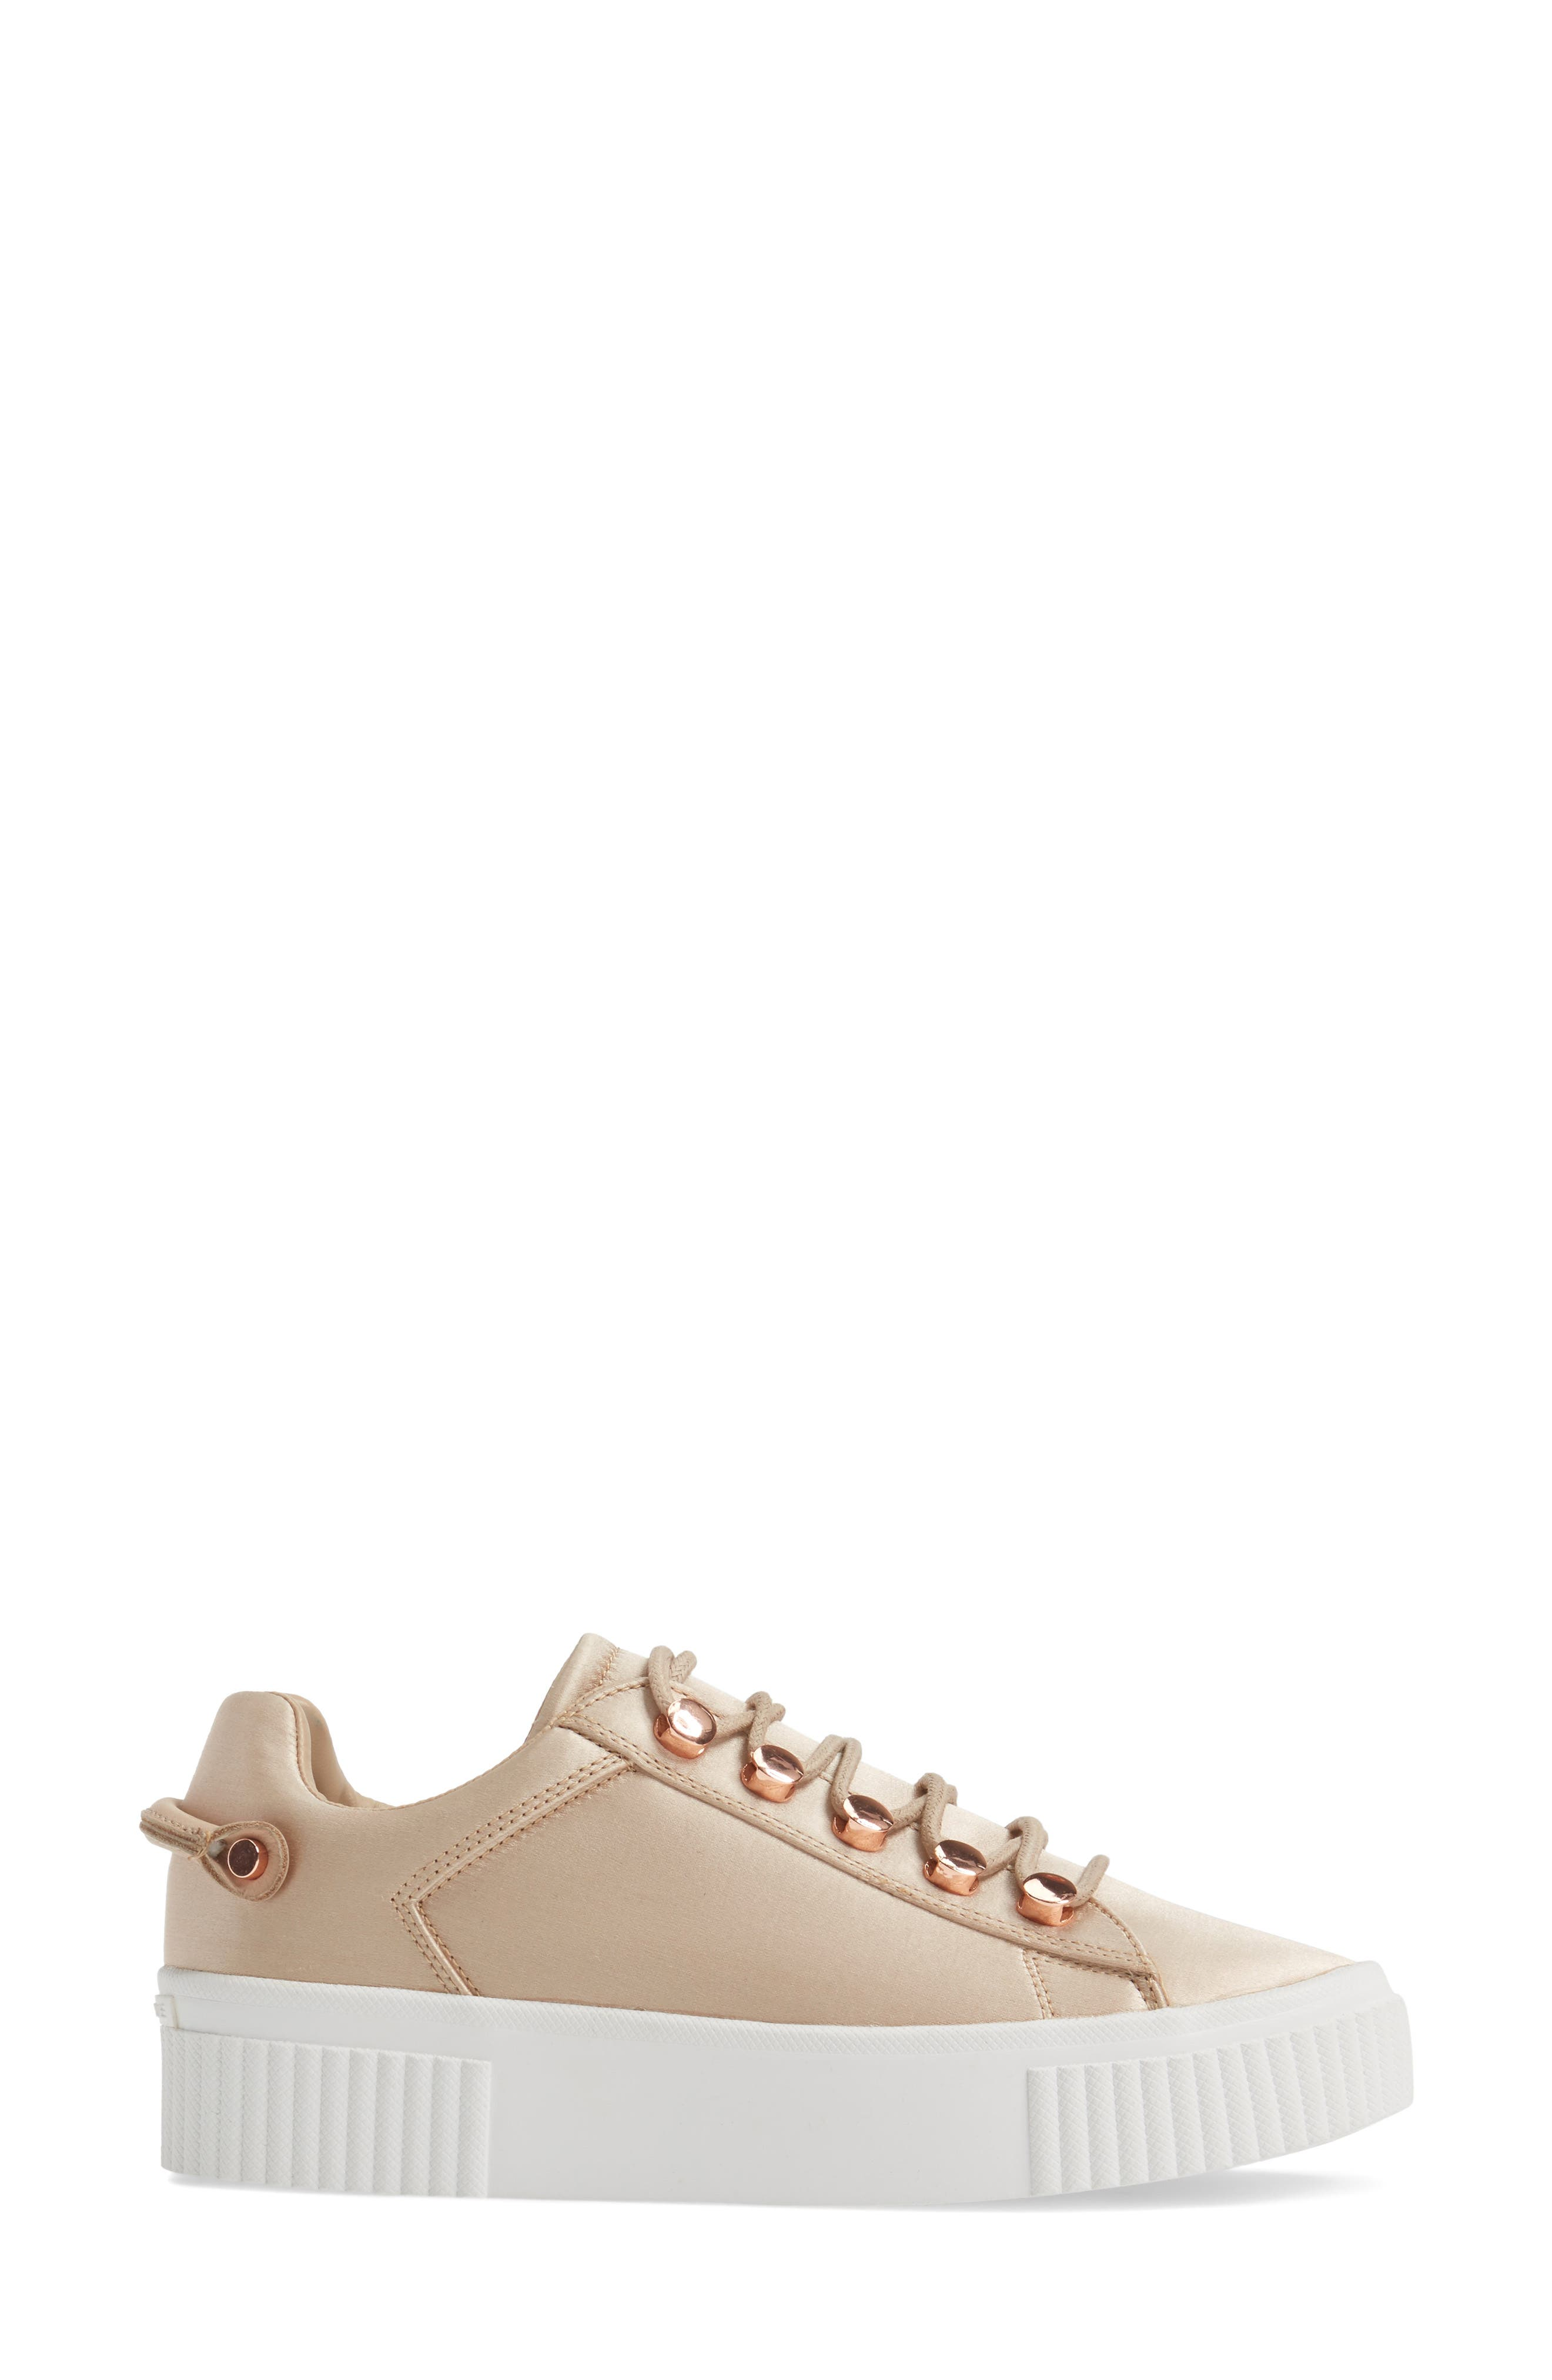 Rae 3 Platform Sneaker,                             Alternate thumbnail 3, color,                             683